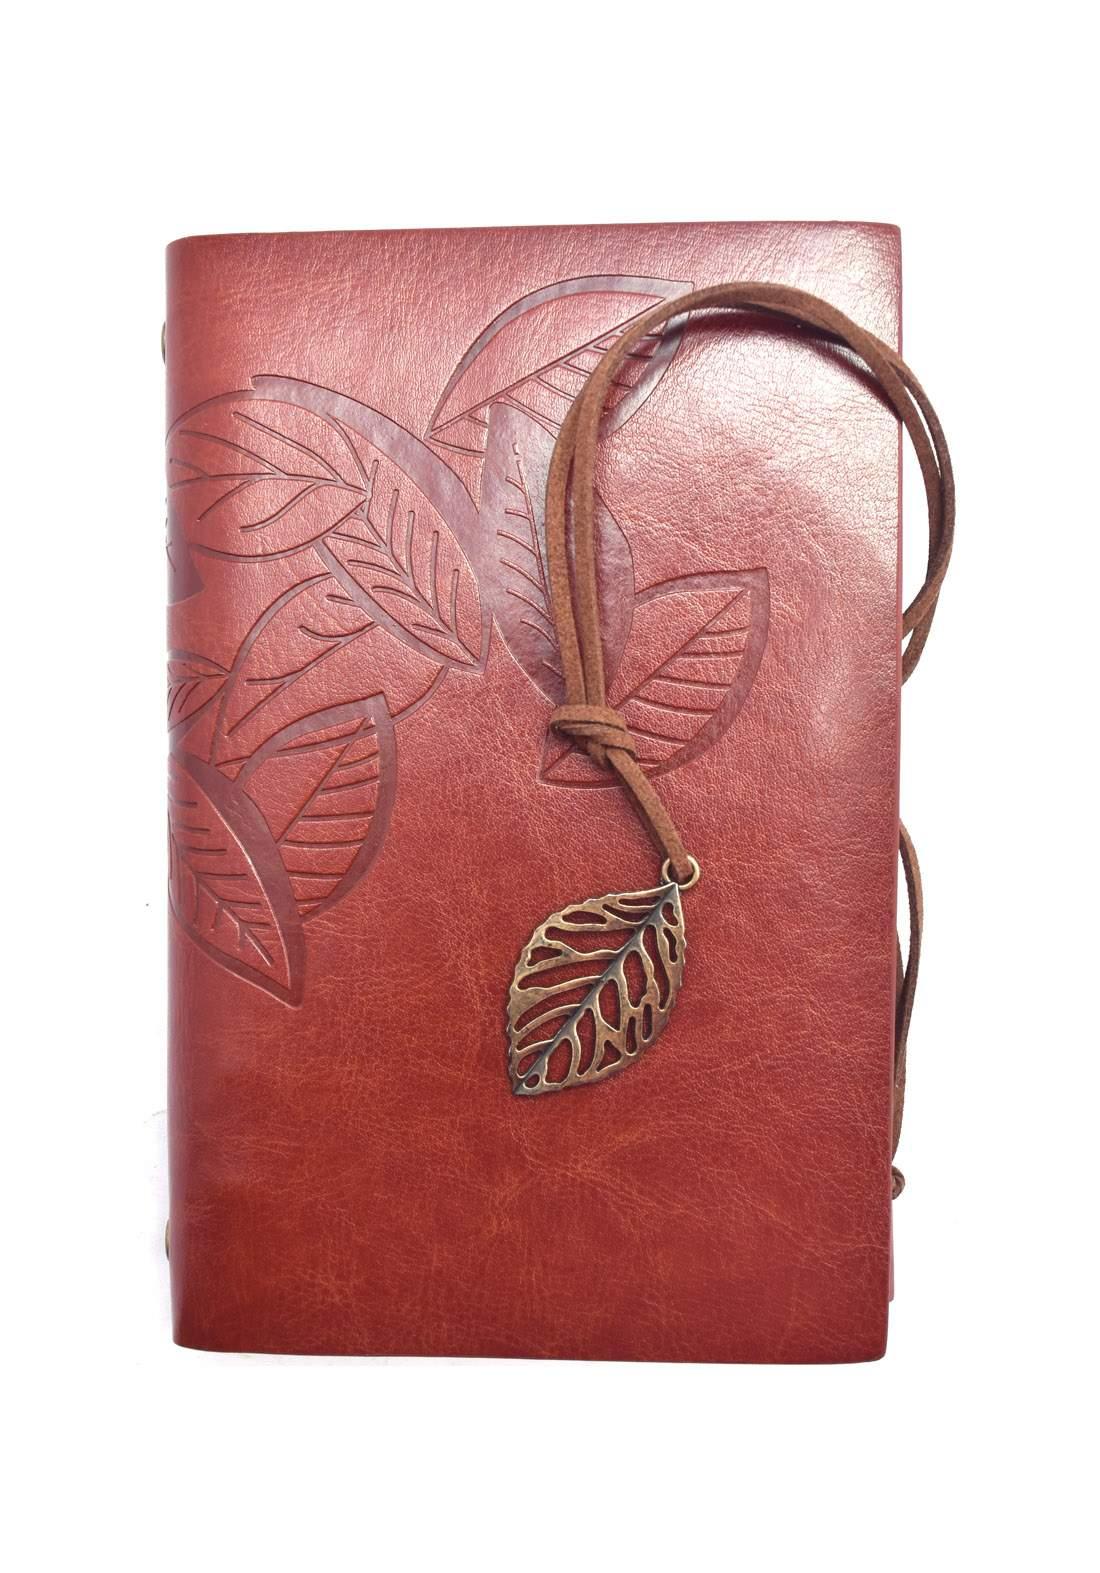 Leather notebook 75 Sheets (18.5*13cm)-دفتر ملاحظات جلد 75 ورقة